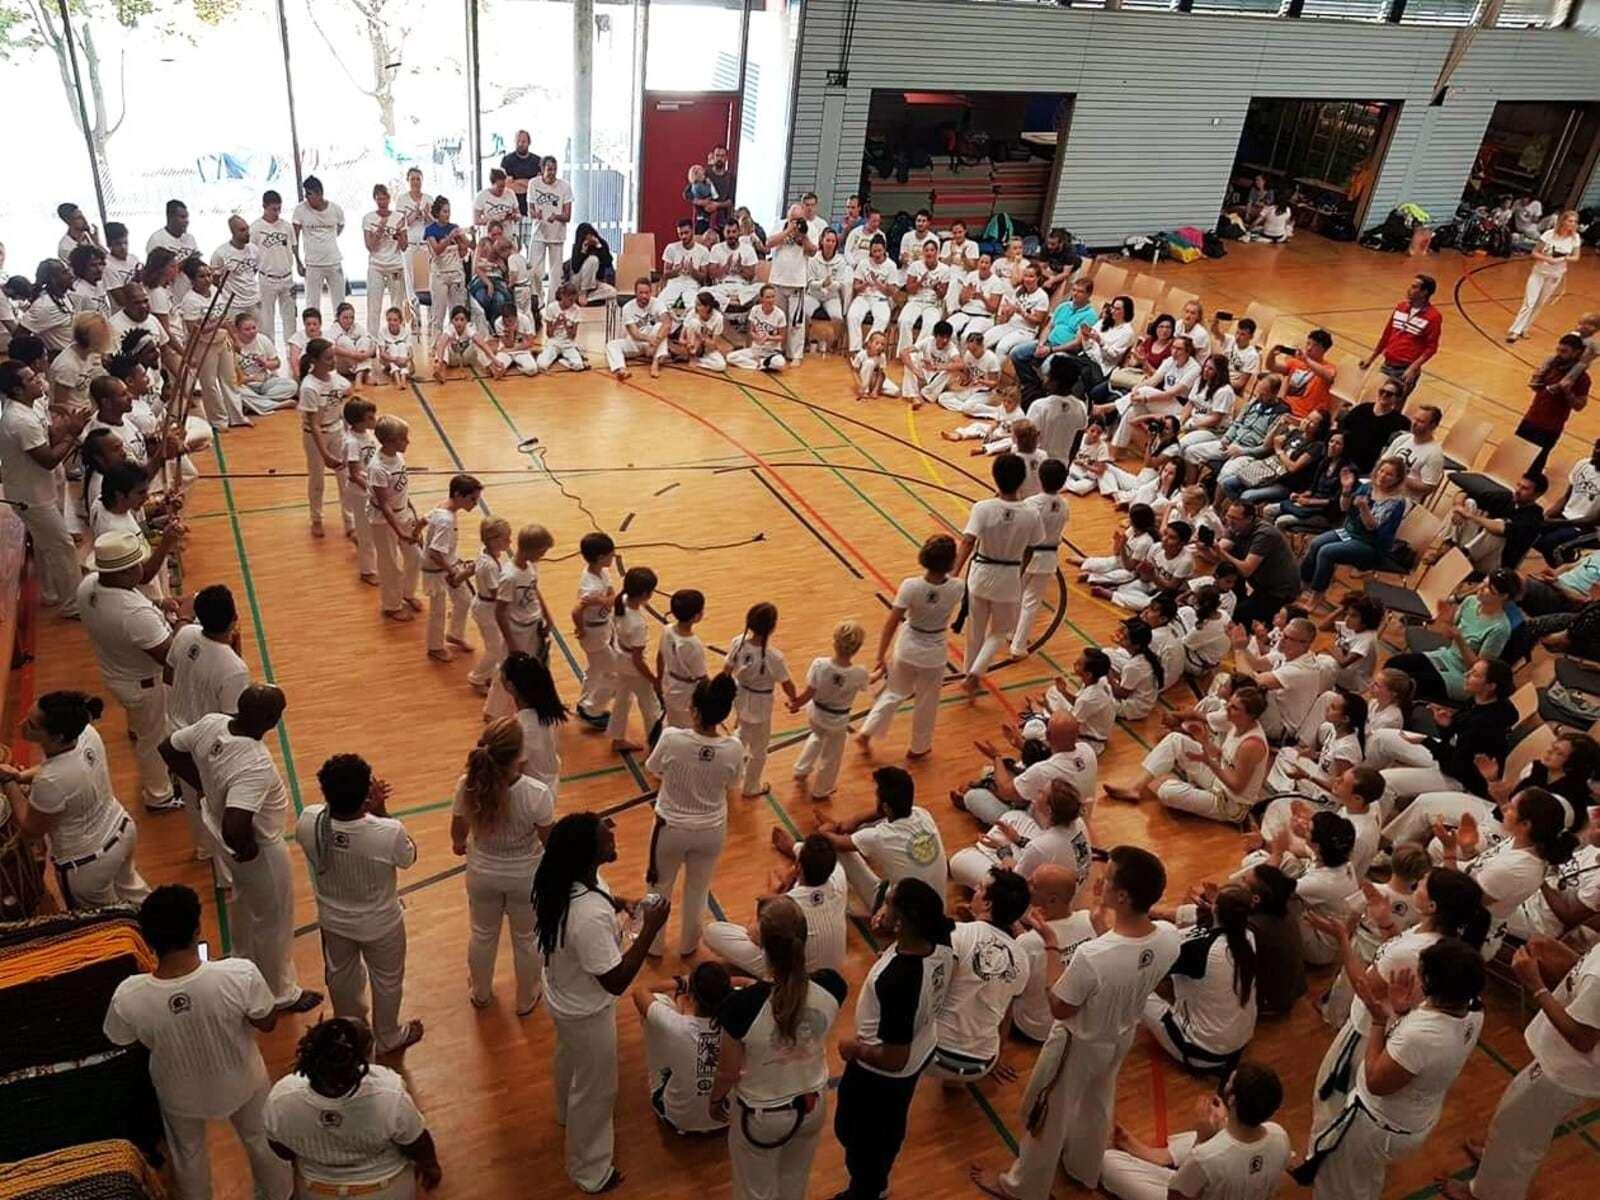 beginners class in capoeira